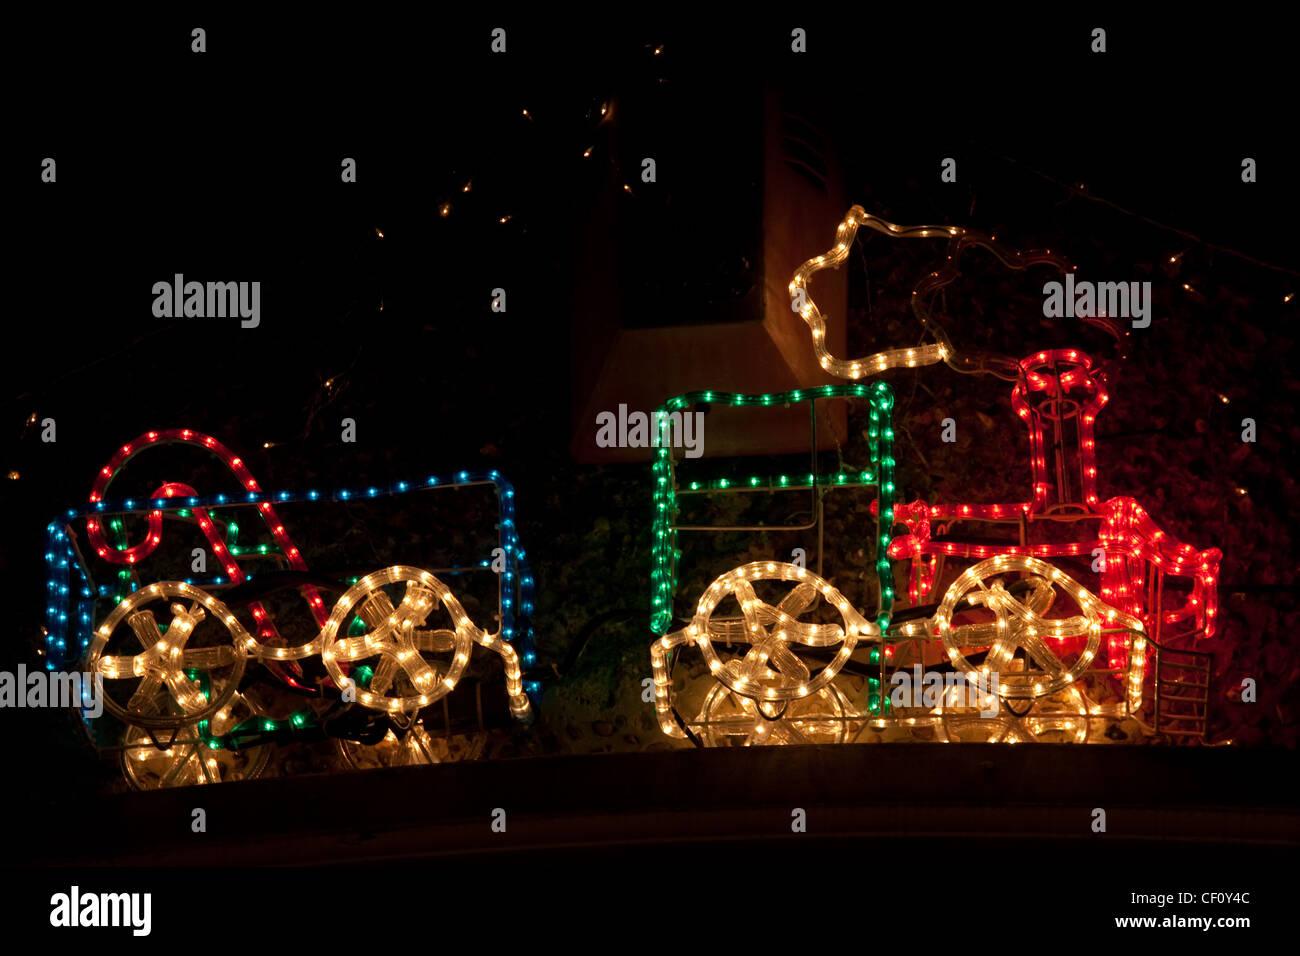 Illuminated steam train stock photos illuminated steam train stock outdoor christmas lights at night stock image aloadofball Image collections